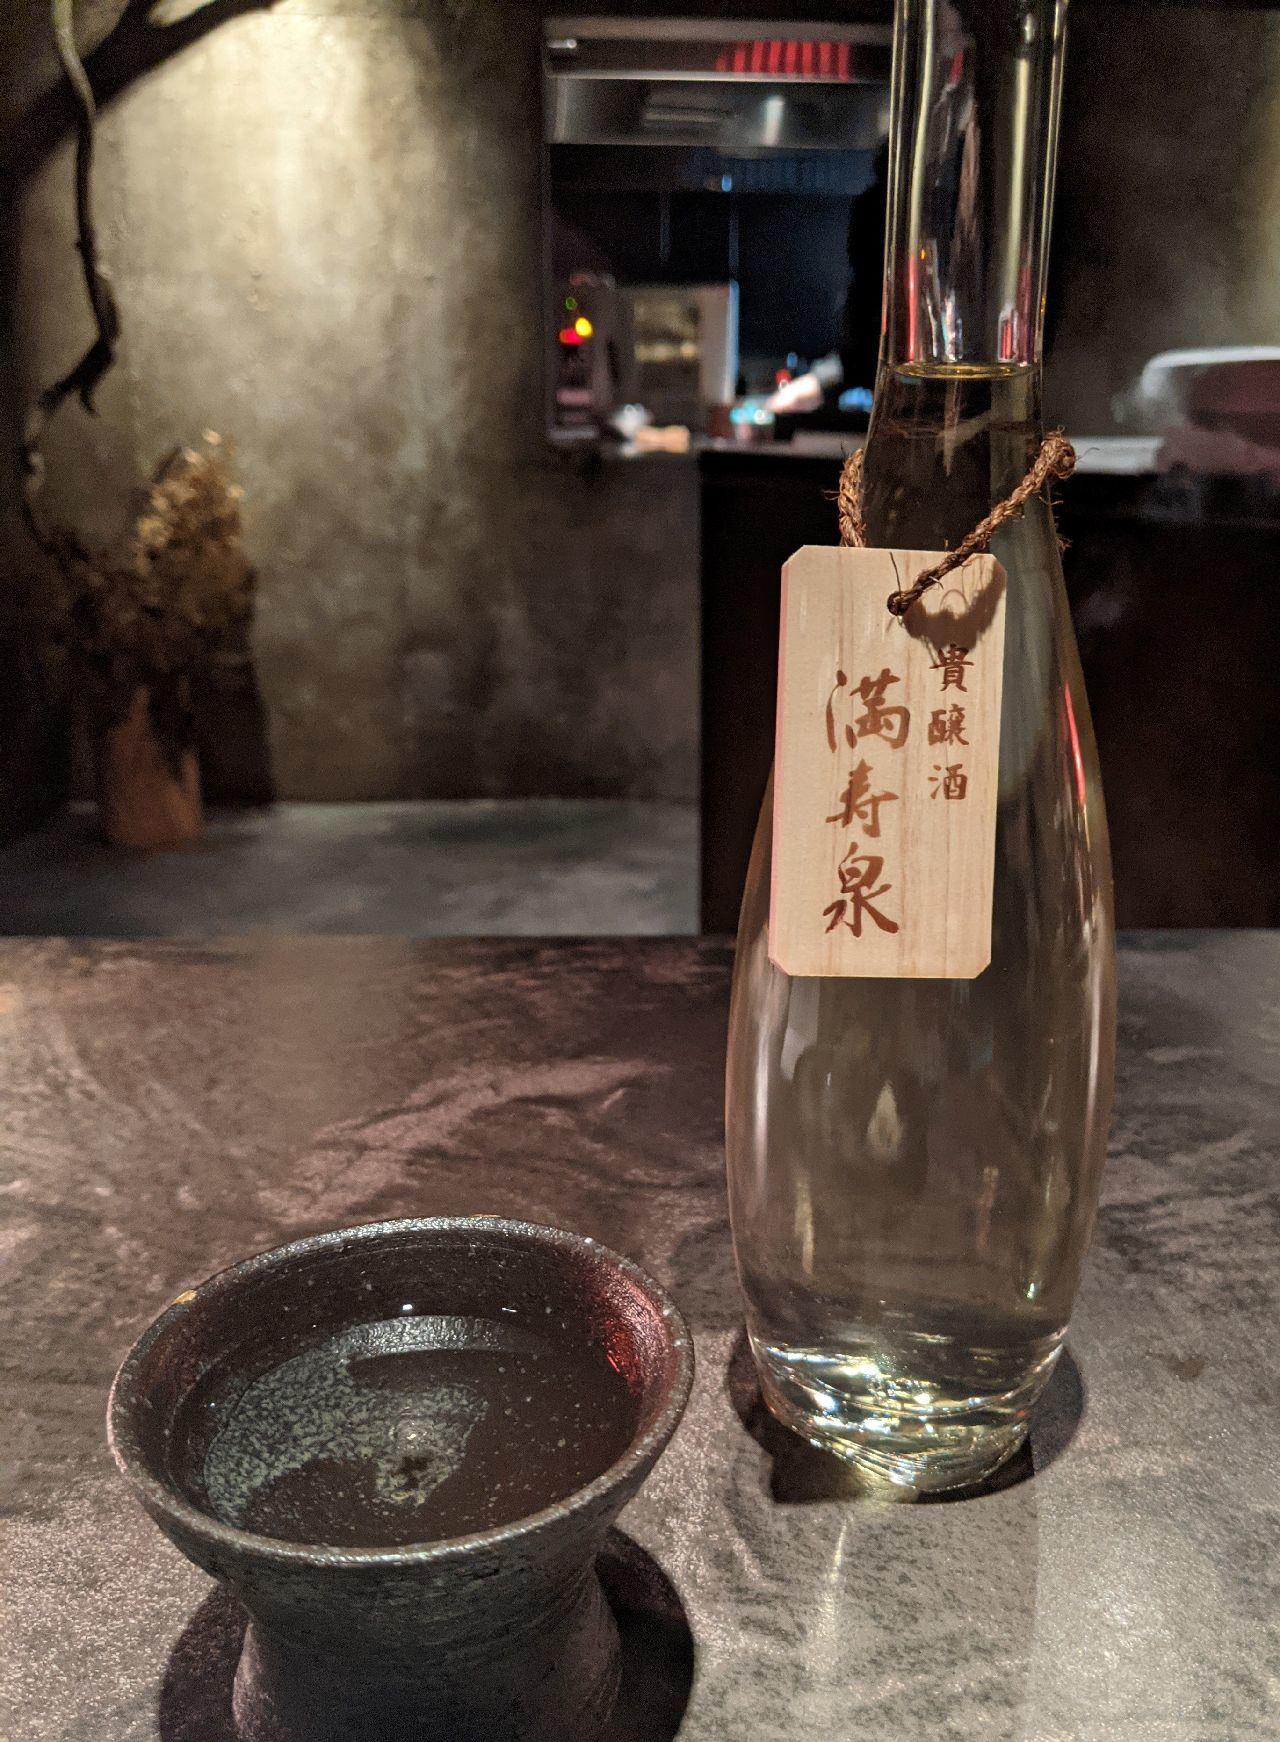 PXL_20210418_092128377満寿泉 貴醸酒